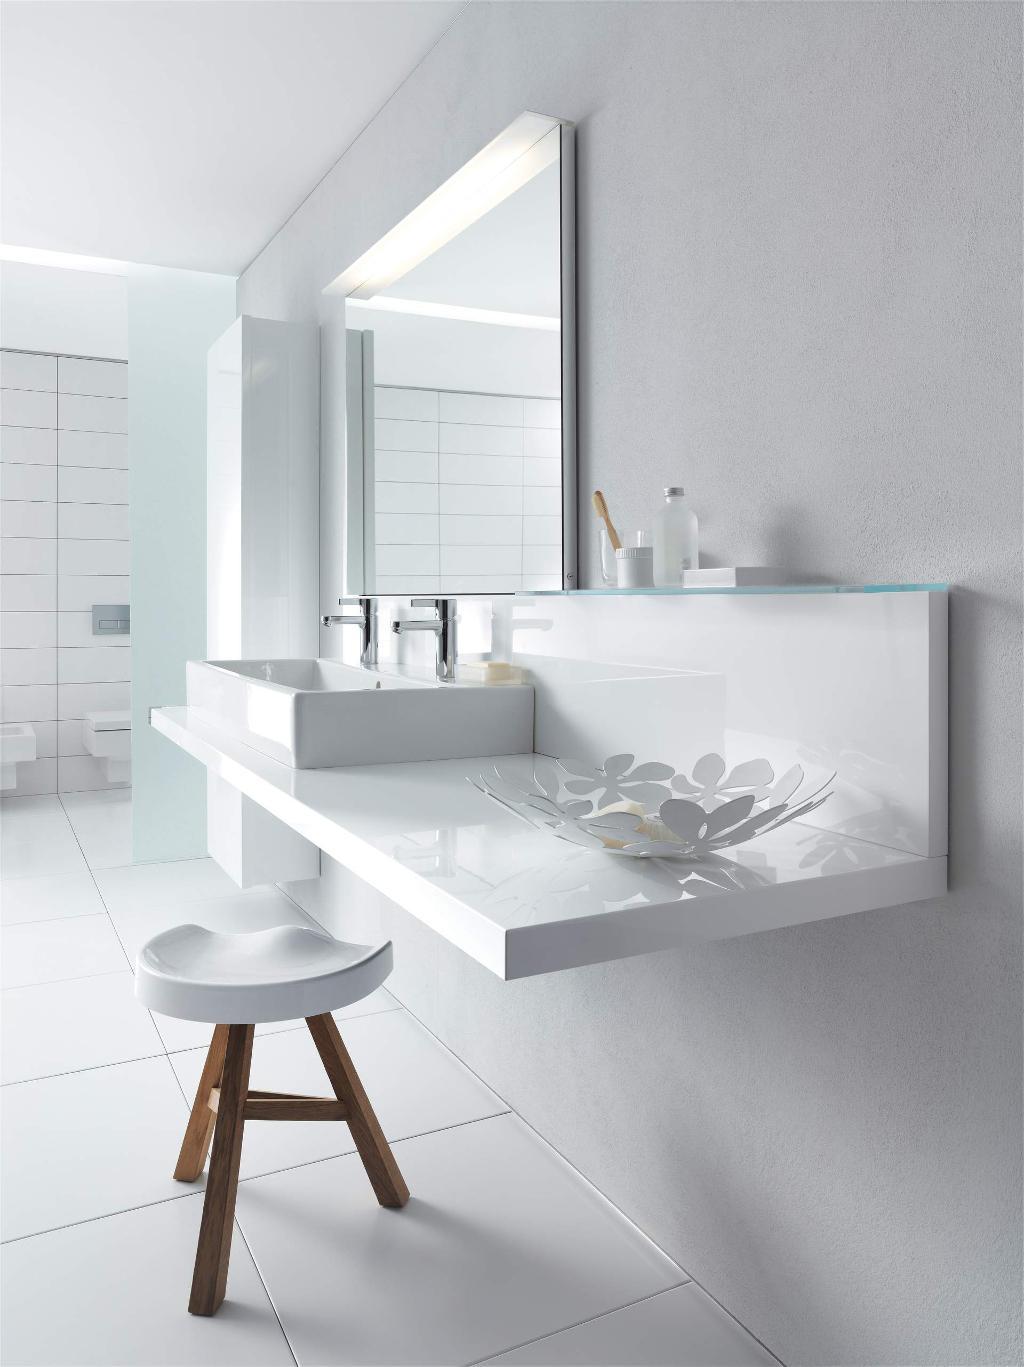 Duravit Delos Bathroom Furniture Designed By Eoos Duravit